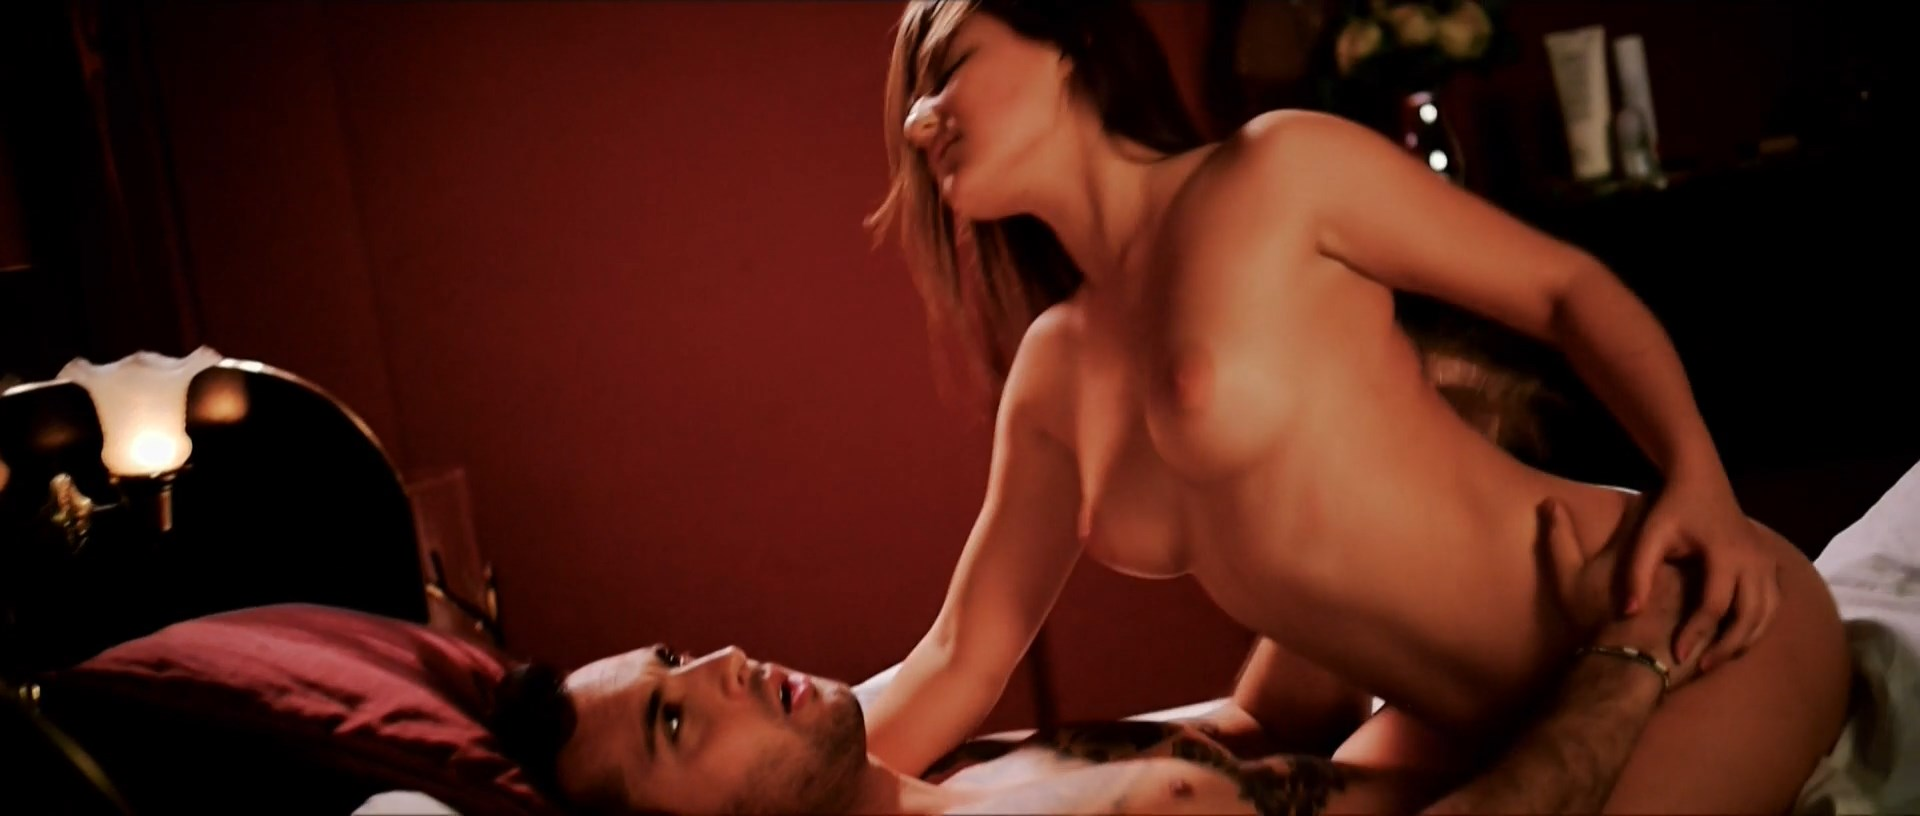 jessica taylor haid nude